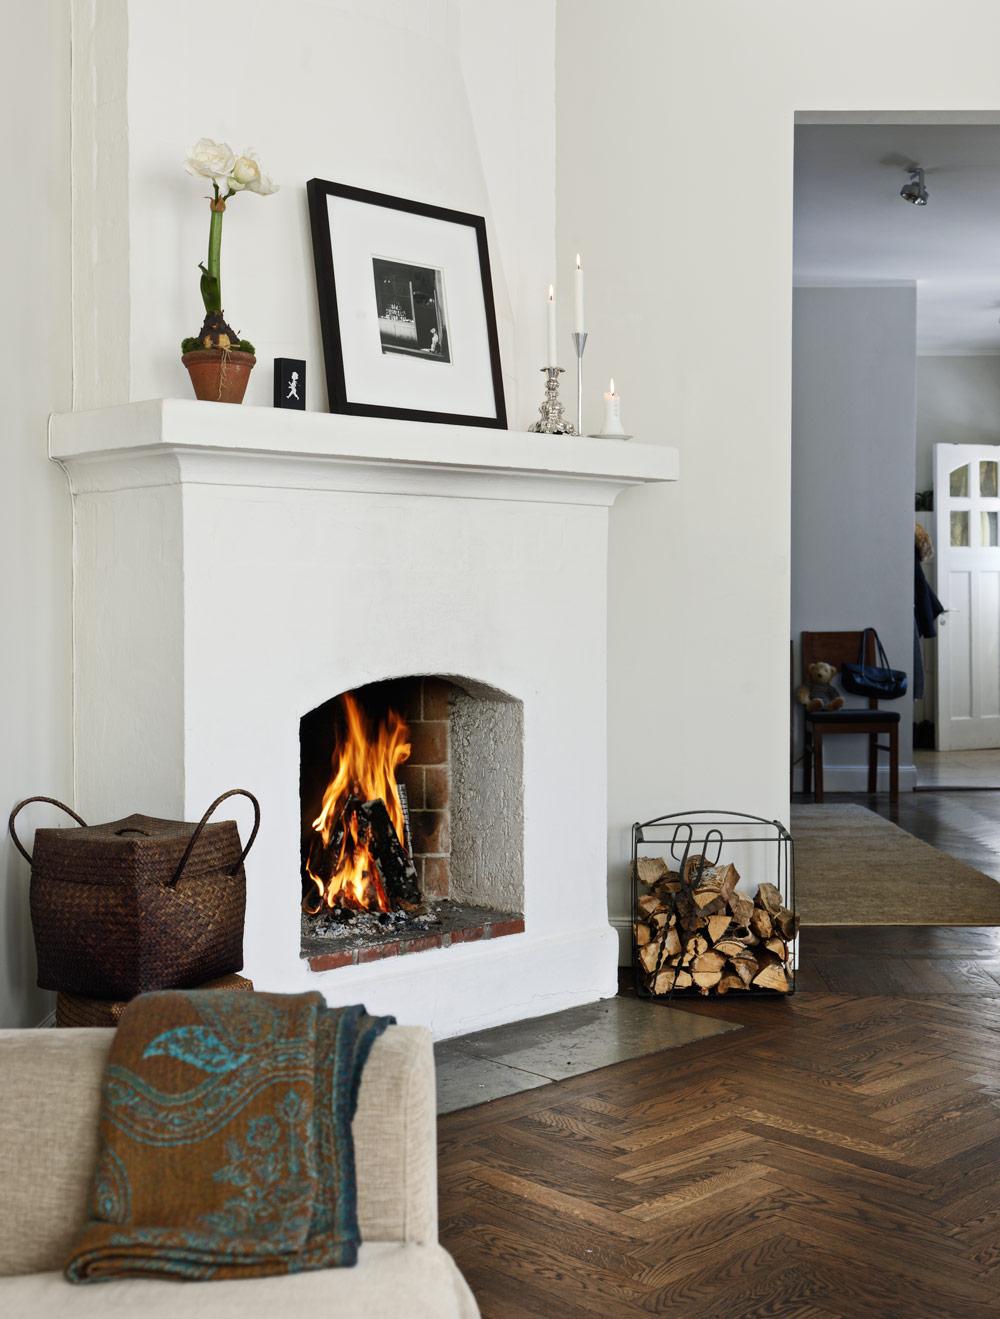 modern-scandinavian-nordic-chic-minimalist-minimalism-swedish-style-fireplace-flooring-ideas-inspiration-home-living-room-all-white